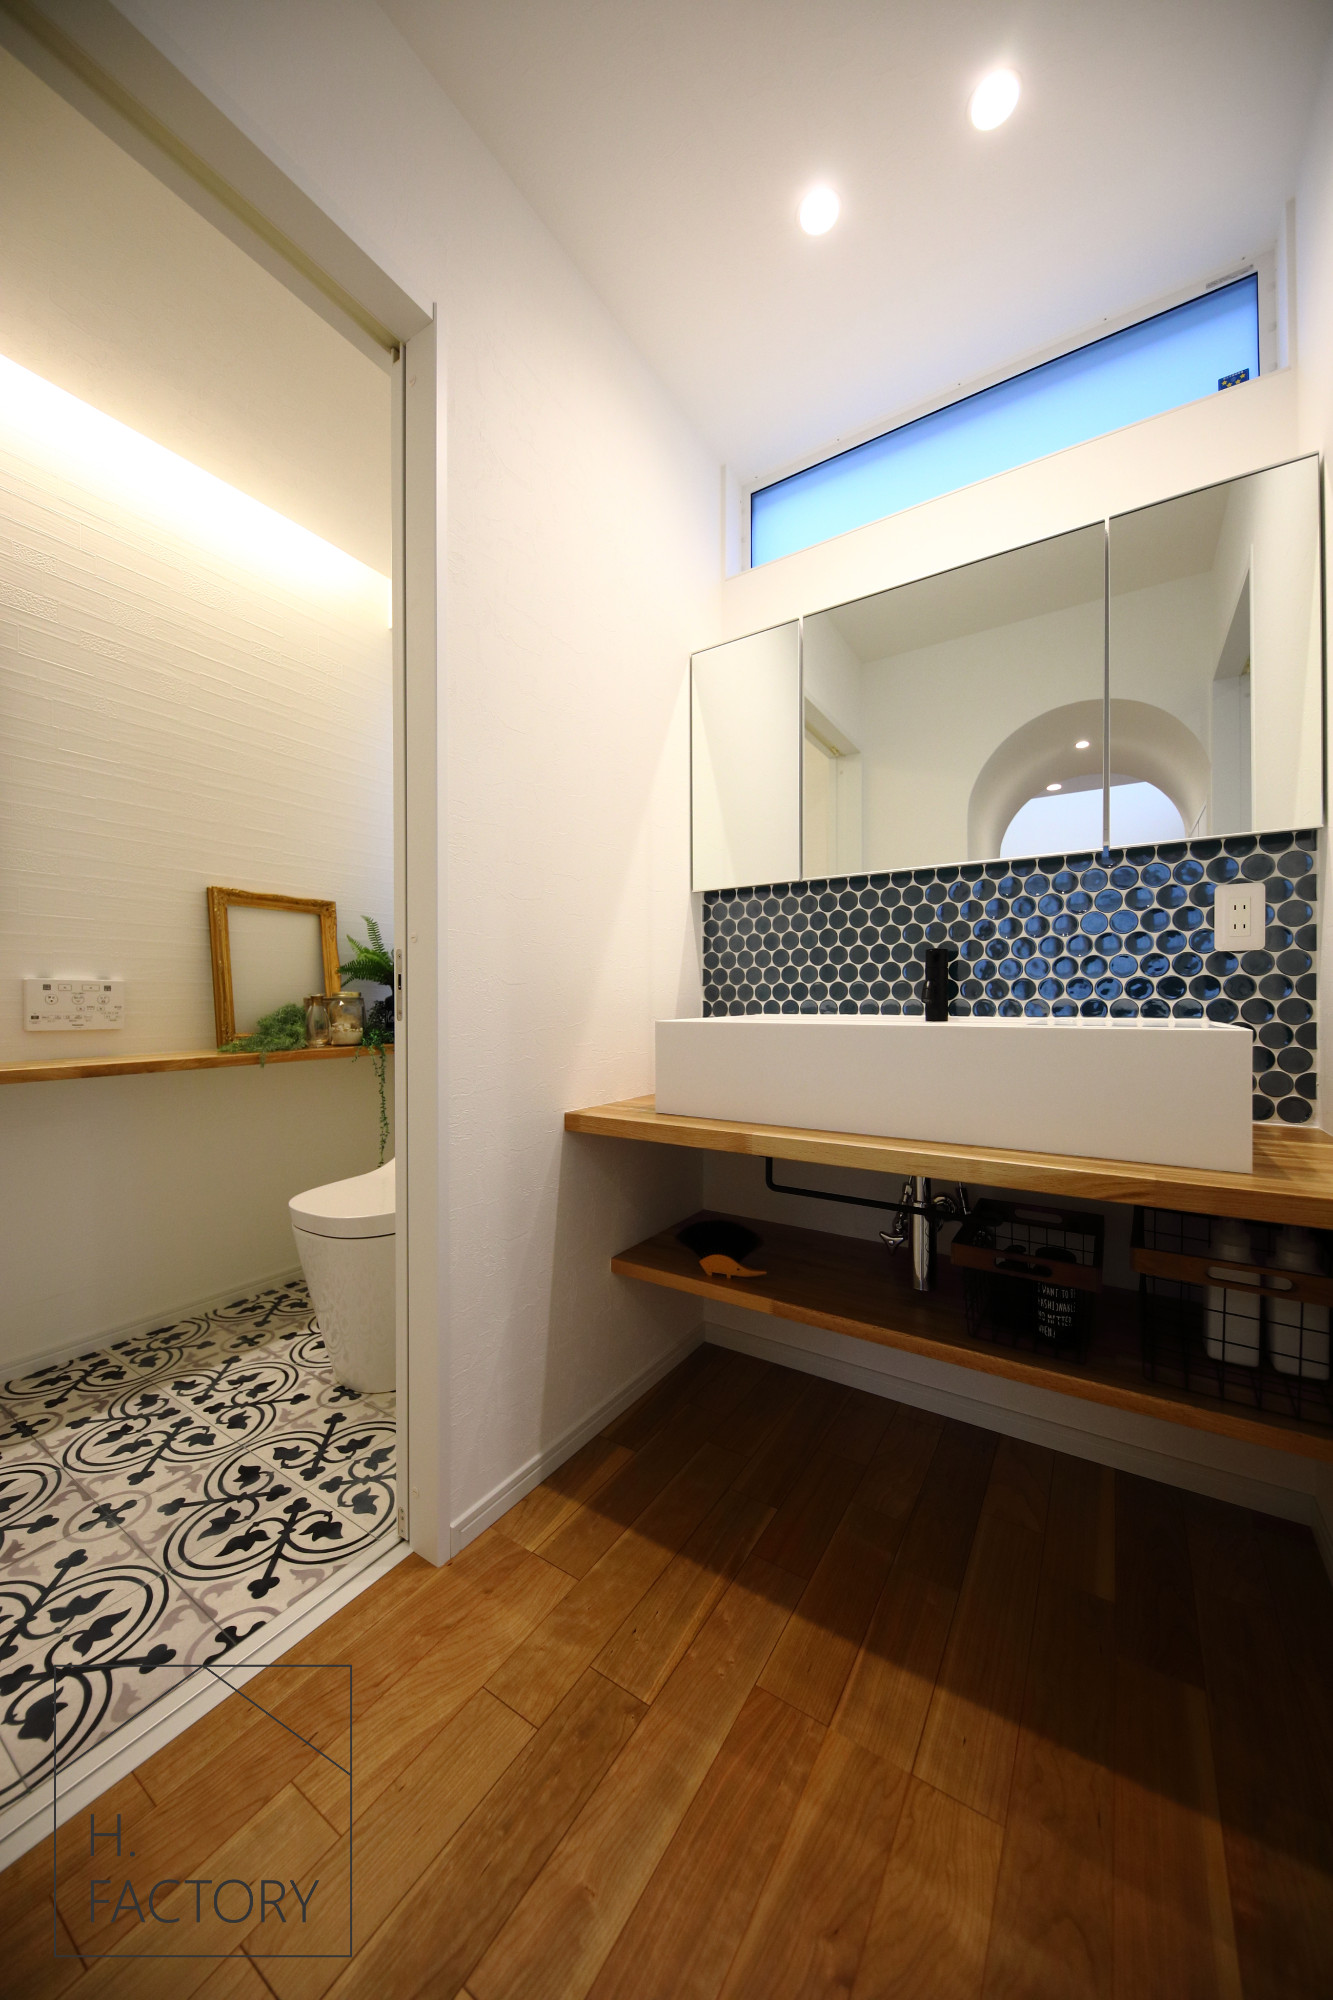 H.FACTORY/株式会社 橋本技建「カルフォルニアスタイルを愉しむ家」の西海岸風な洗面所・脱衣所の実例写真